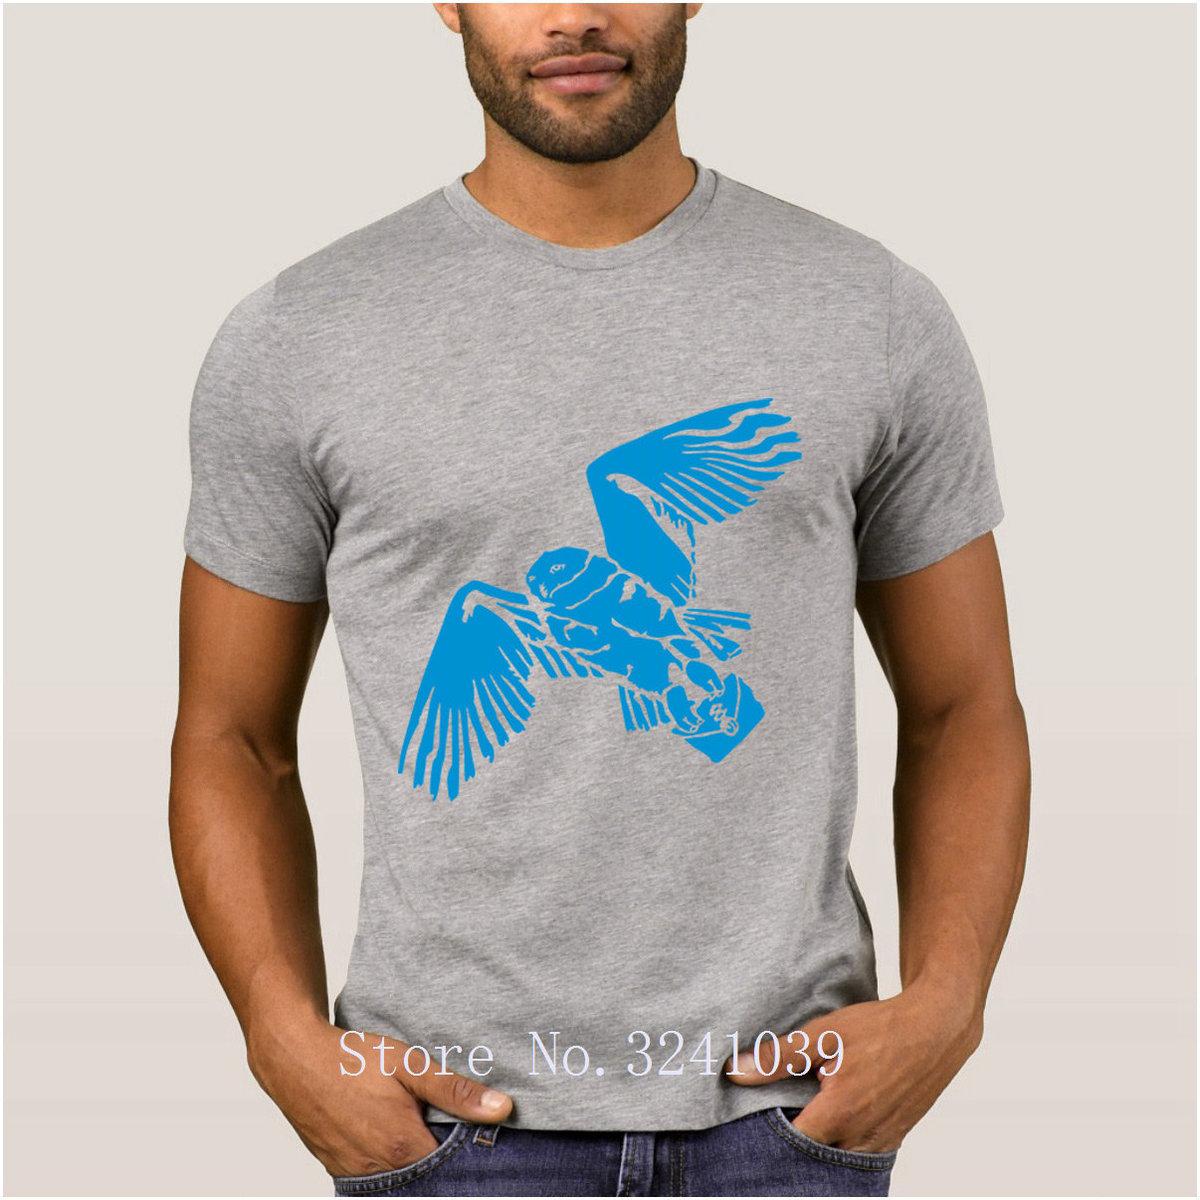 La Maxpa Printing Building hedwig negative men's t shirt Sunlight Graphic t-shirt man Novelty tshirt Euro Size S-3xl Basic Solid